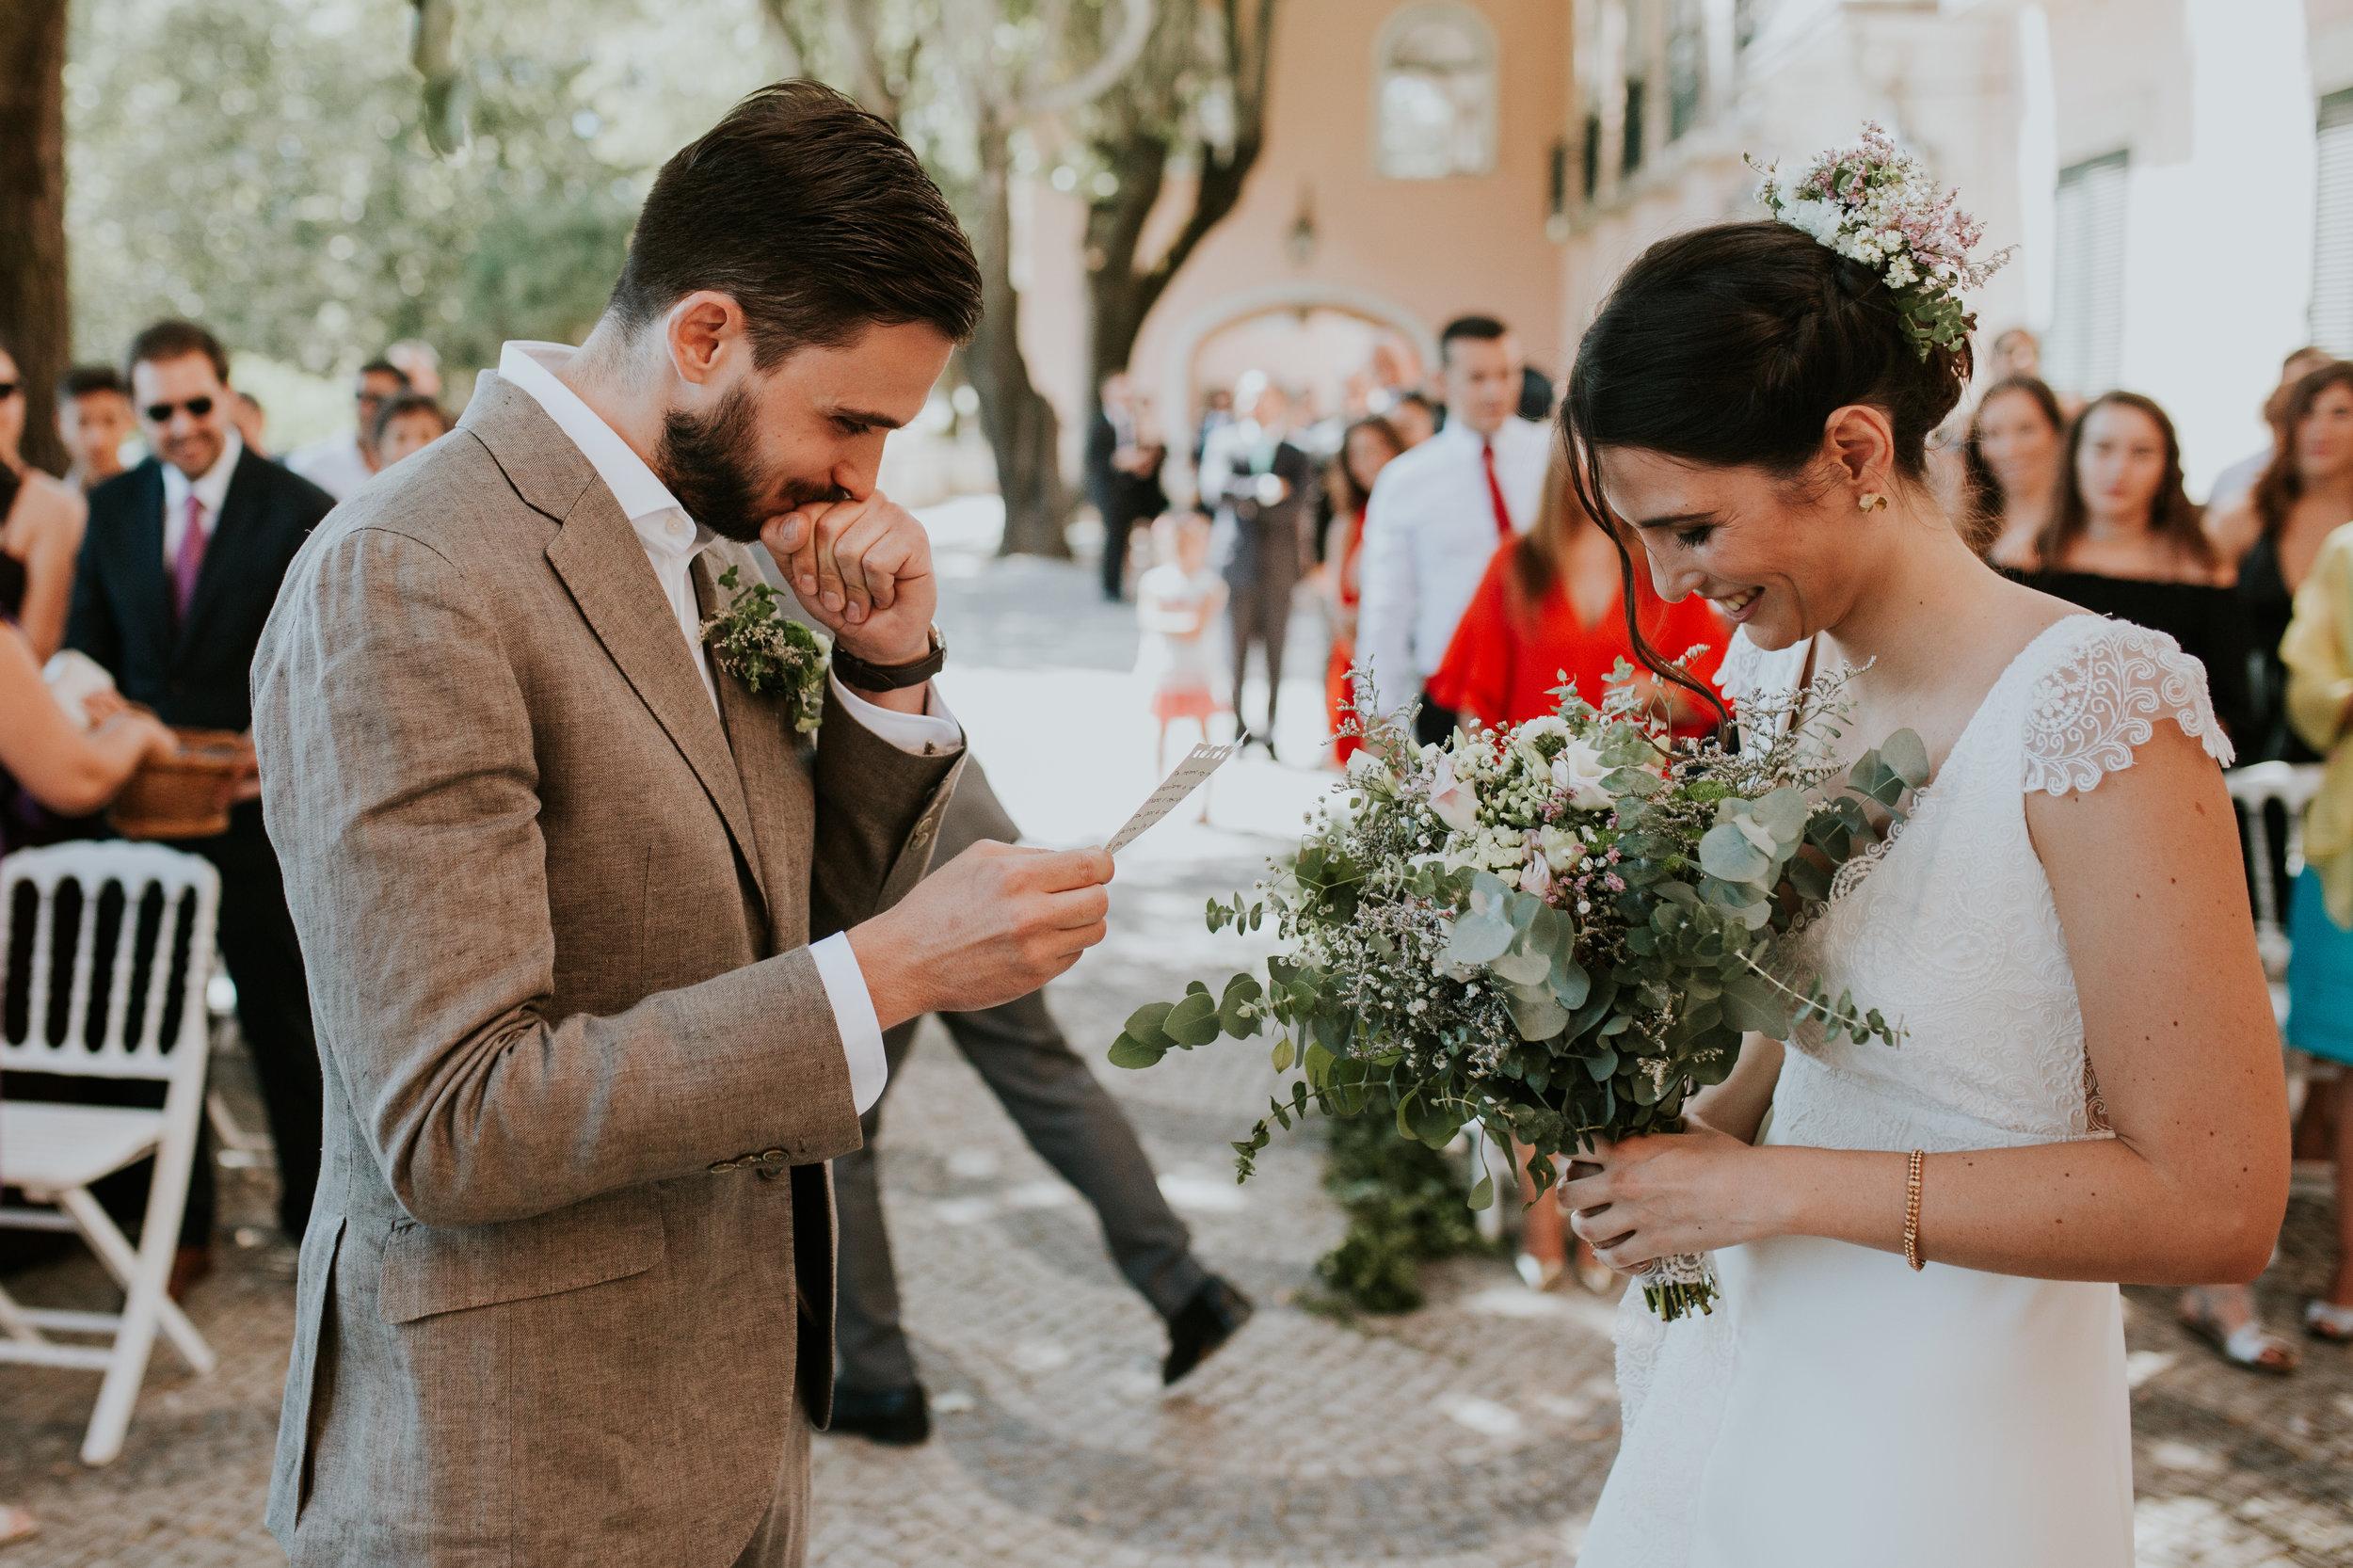 J&P 246_ 02 setembro 2017 Wedding day_.jpg